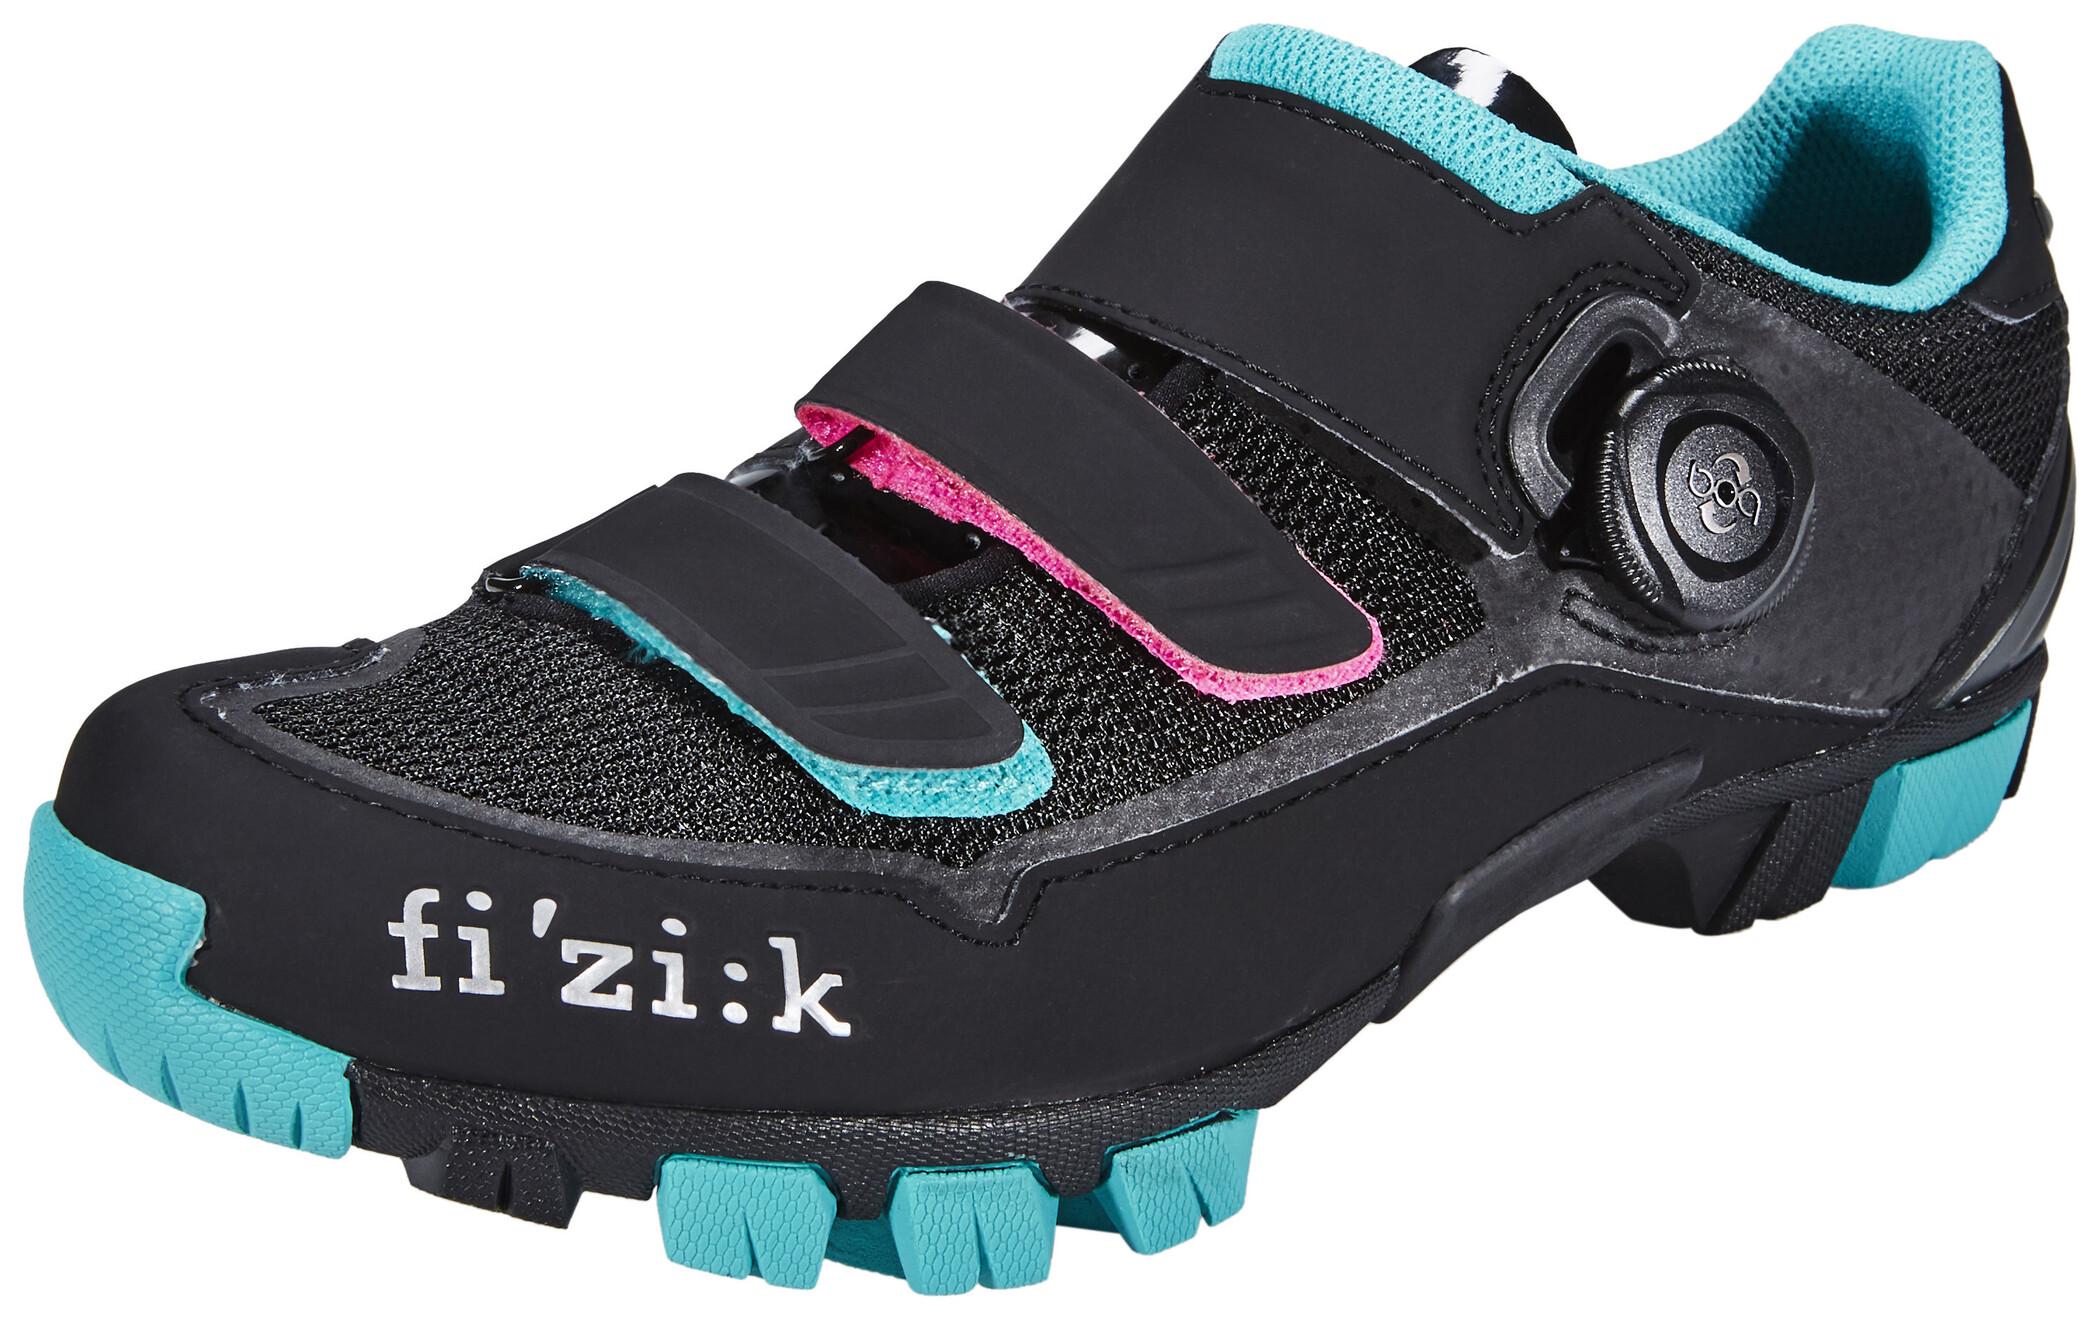 Fizik M6B MTB sko Damer, black/anthracite/green (2019) | Shoes and overlays